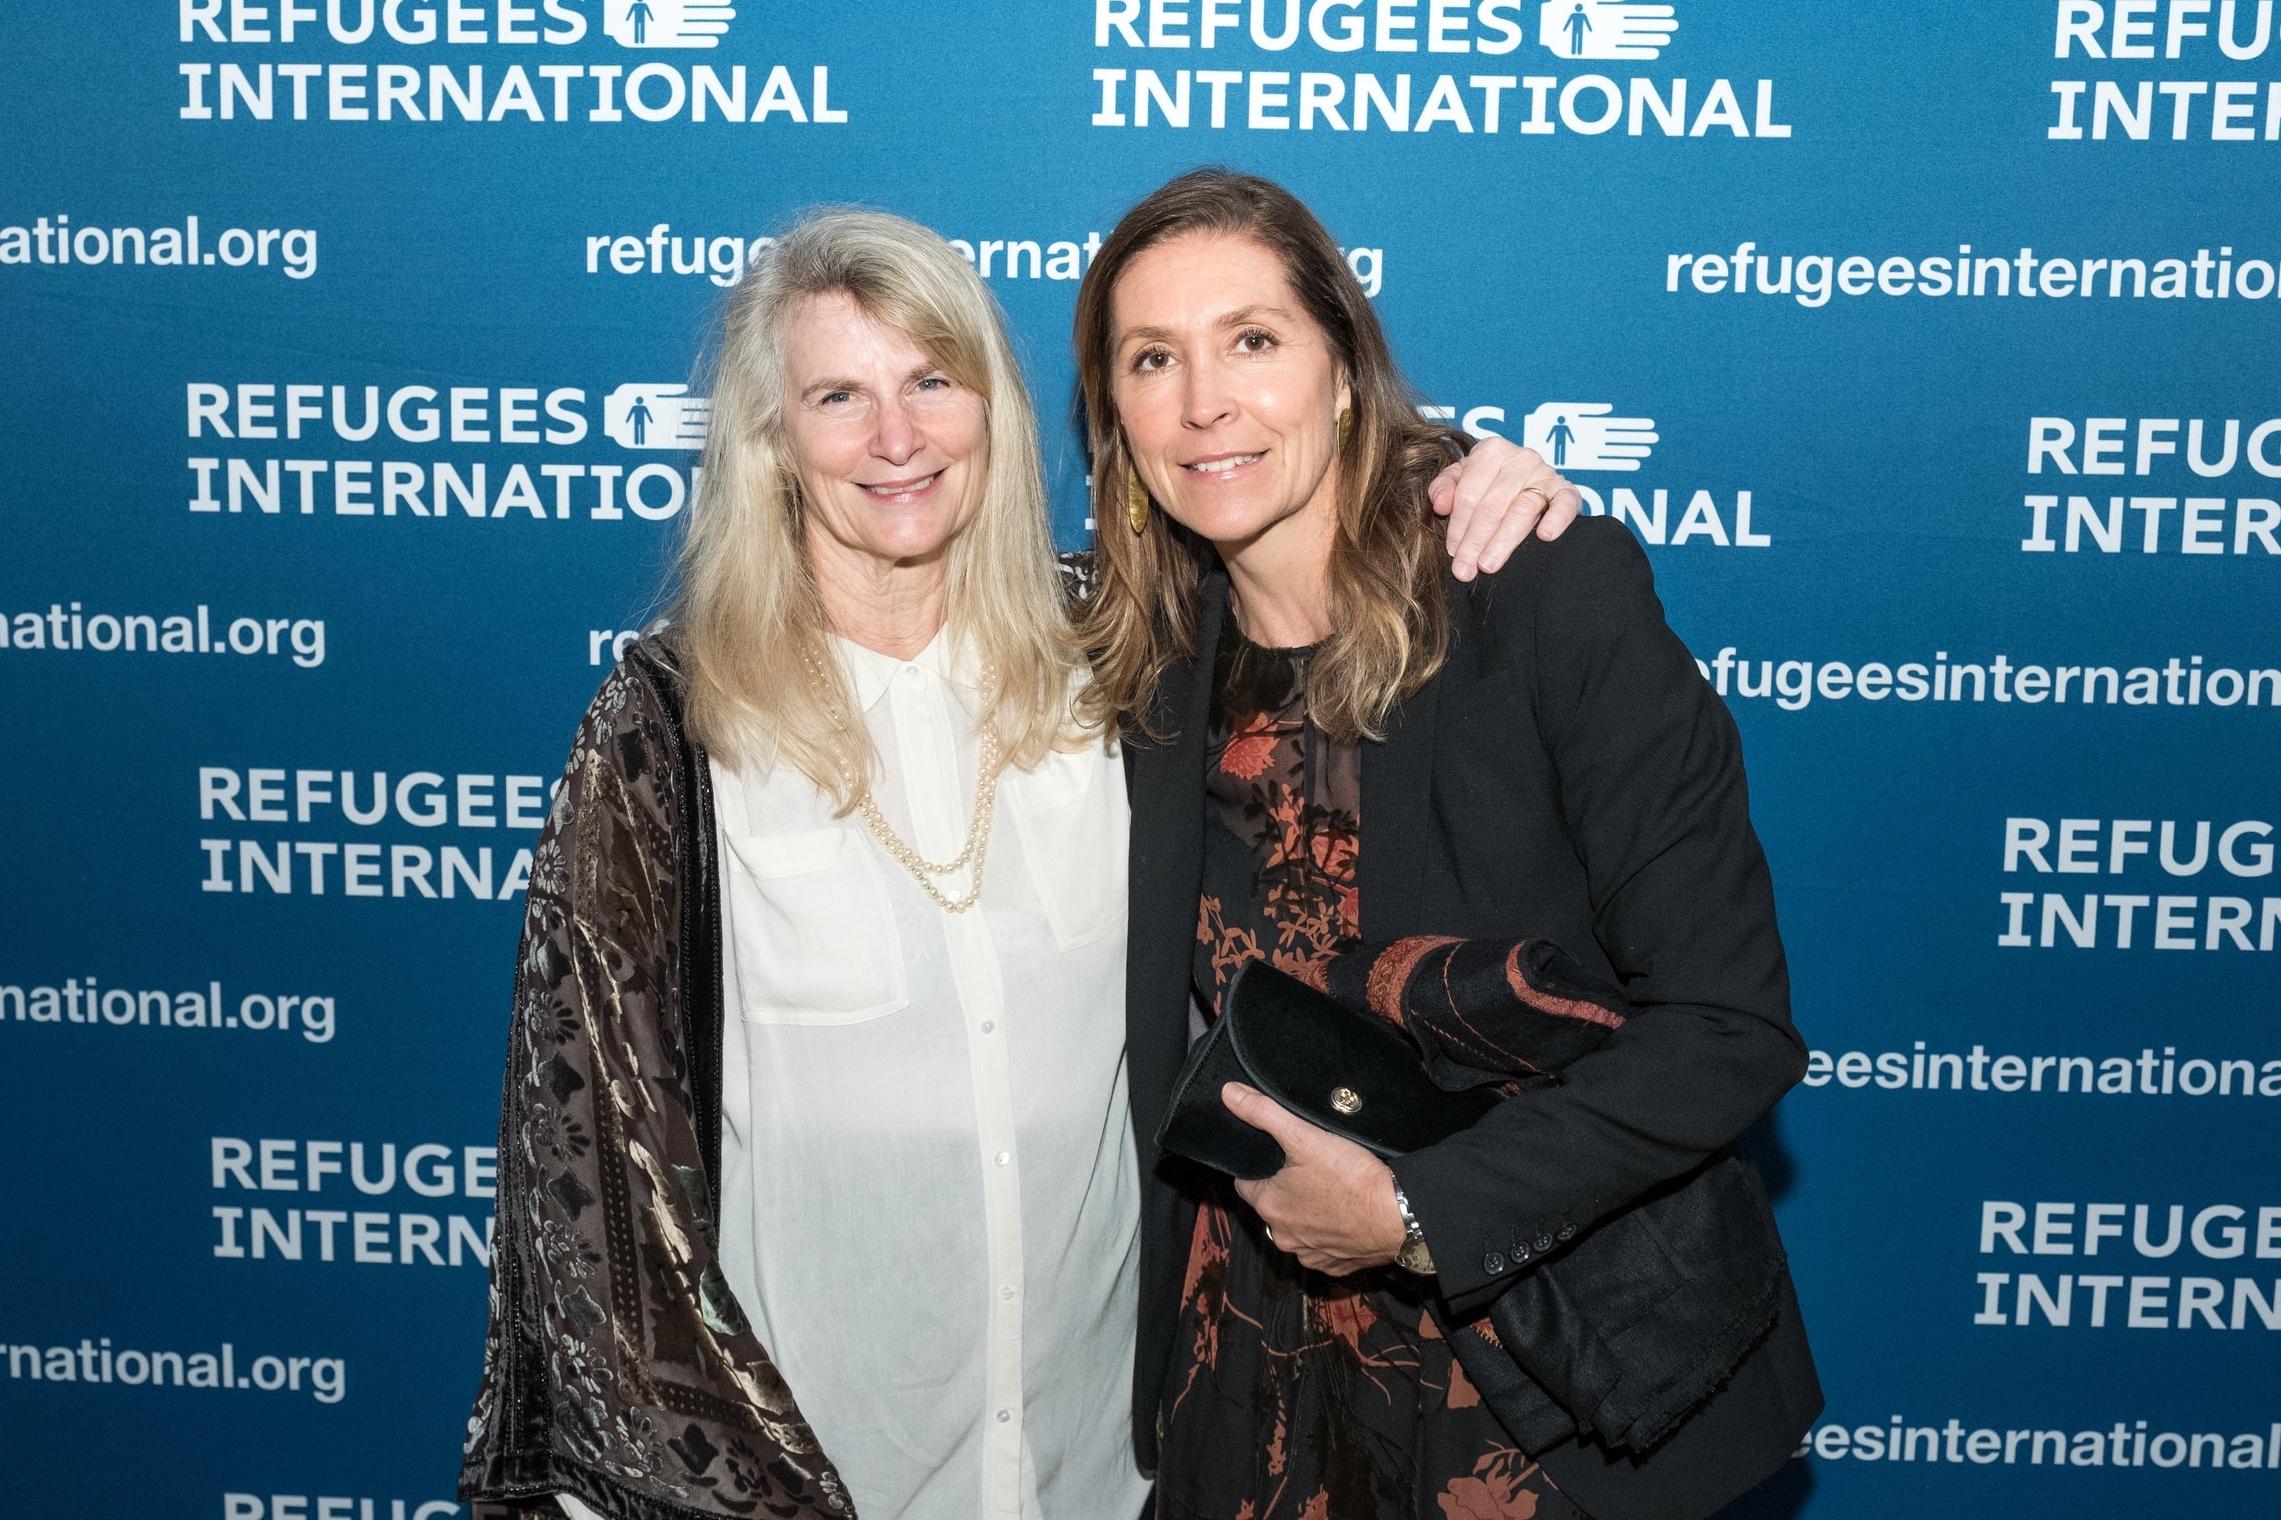 Board Members Jan Weil and Natacha Weiss